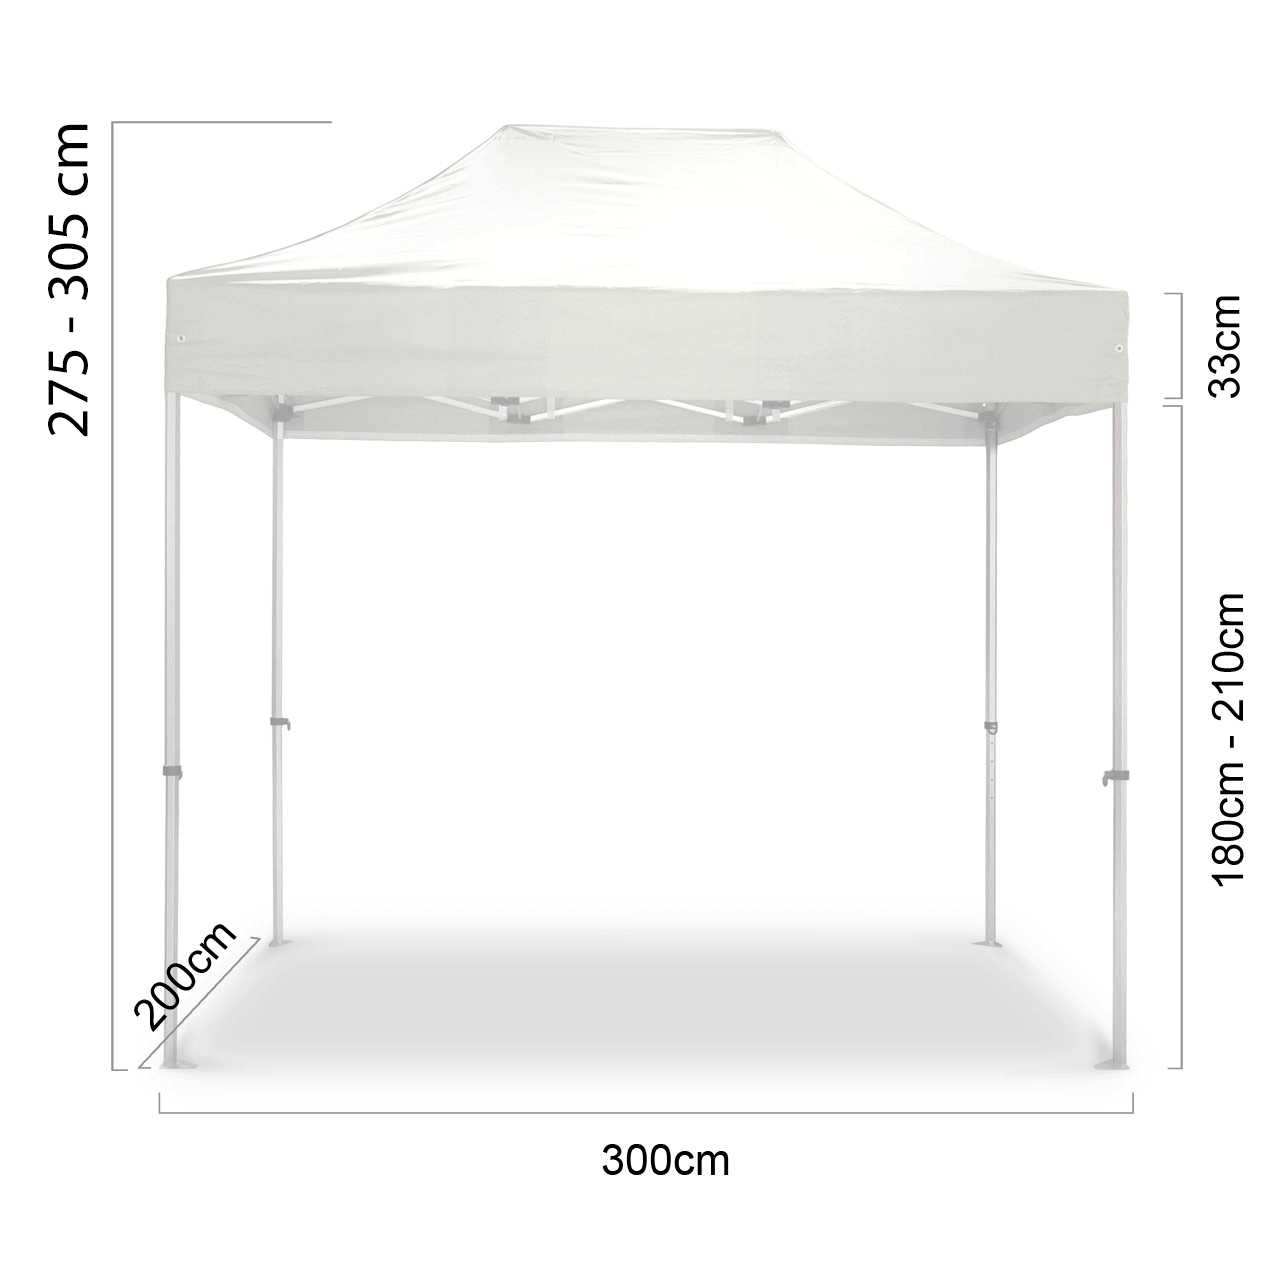 Duratent-Faltpavillon-2x3-Abmessung6152d3160af17